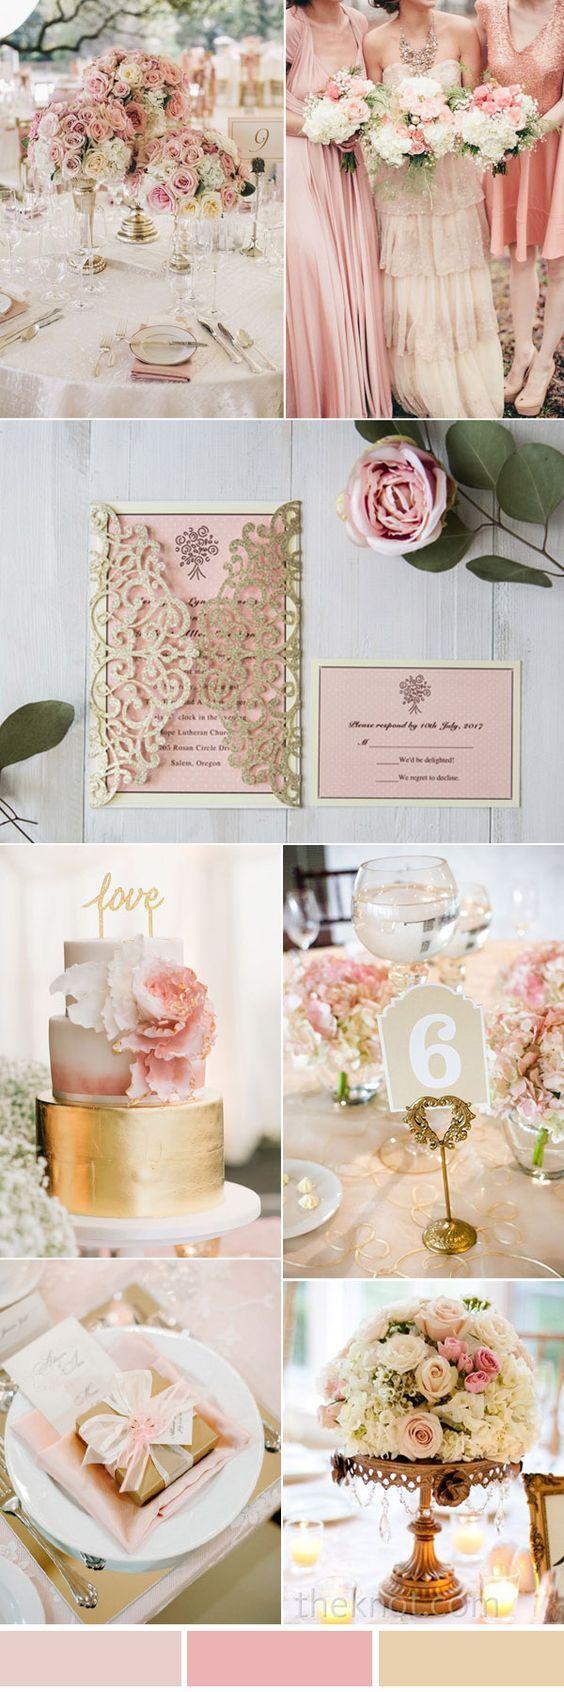 Trendy Glitter Gold & Silver Wedding Invitations From EWI 2017 New ...